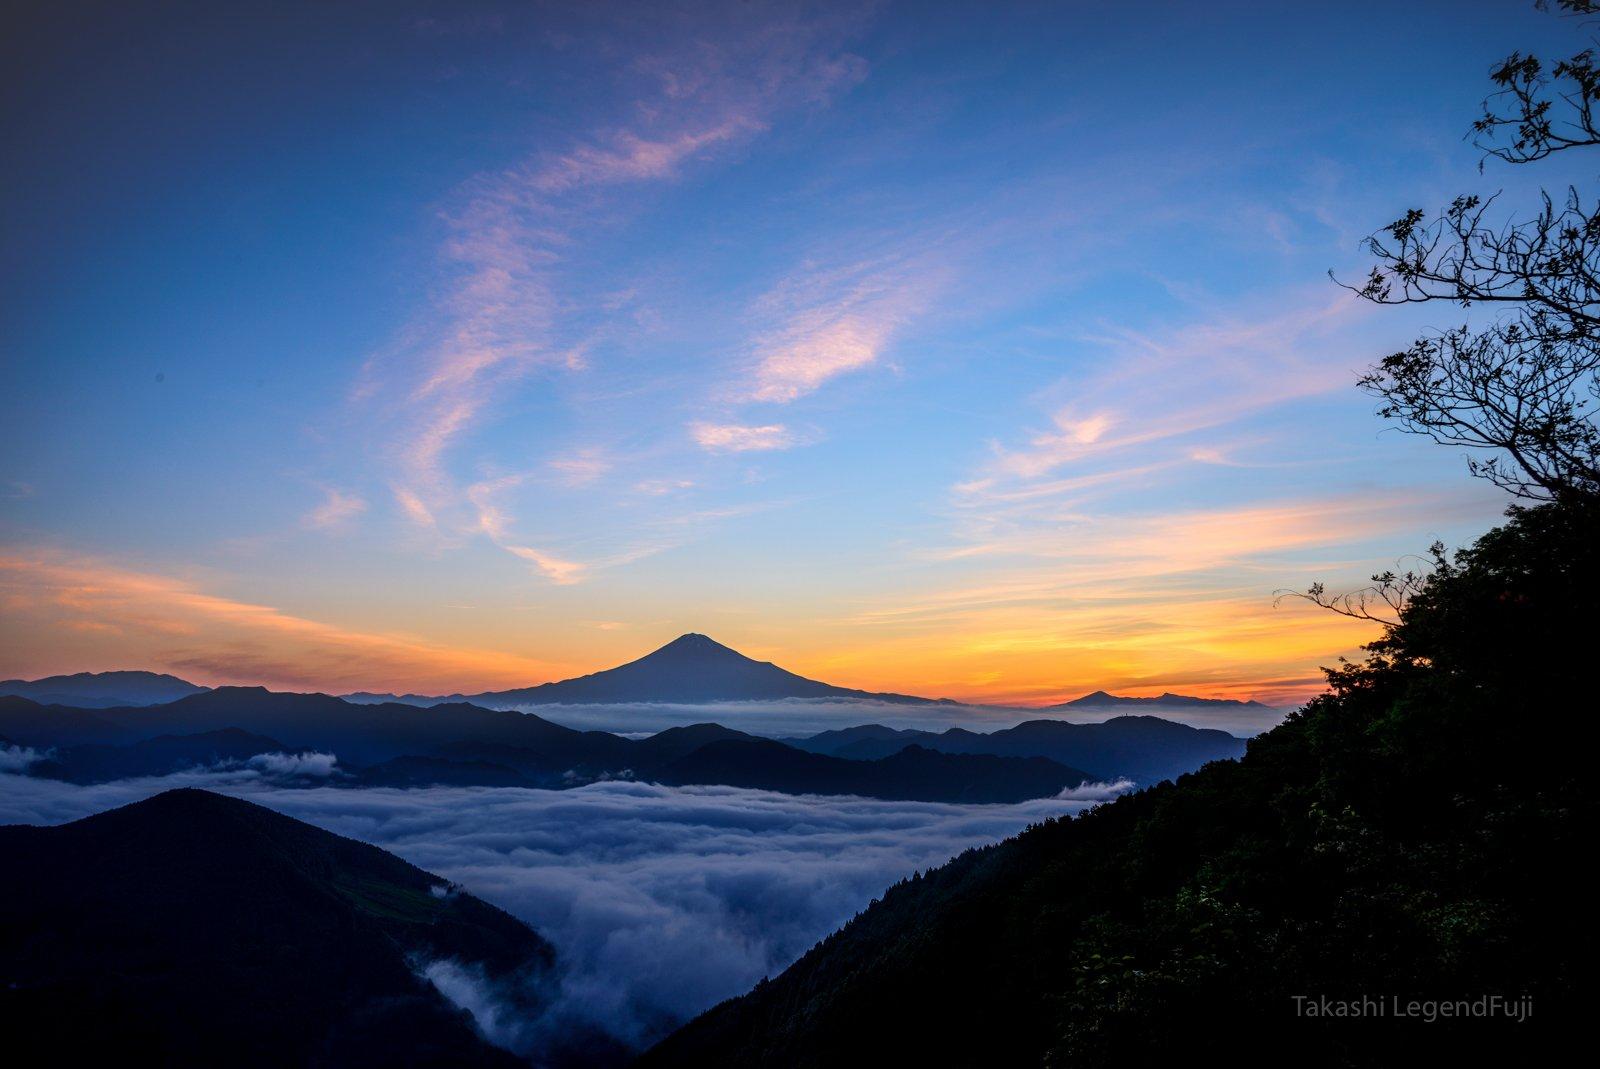 fuji,mountain,Japan,cloud,sky,orange,pink,blue,valley,beautiful,sea of cloud,, Takashi